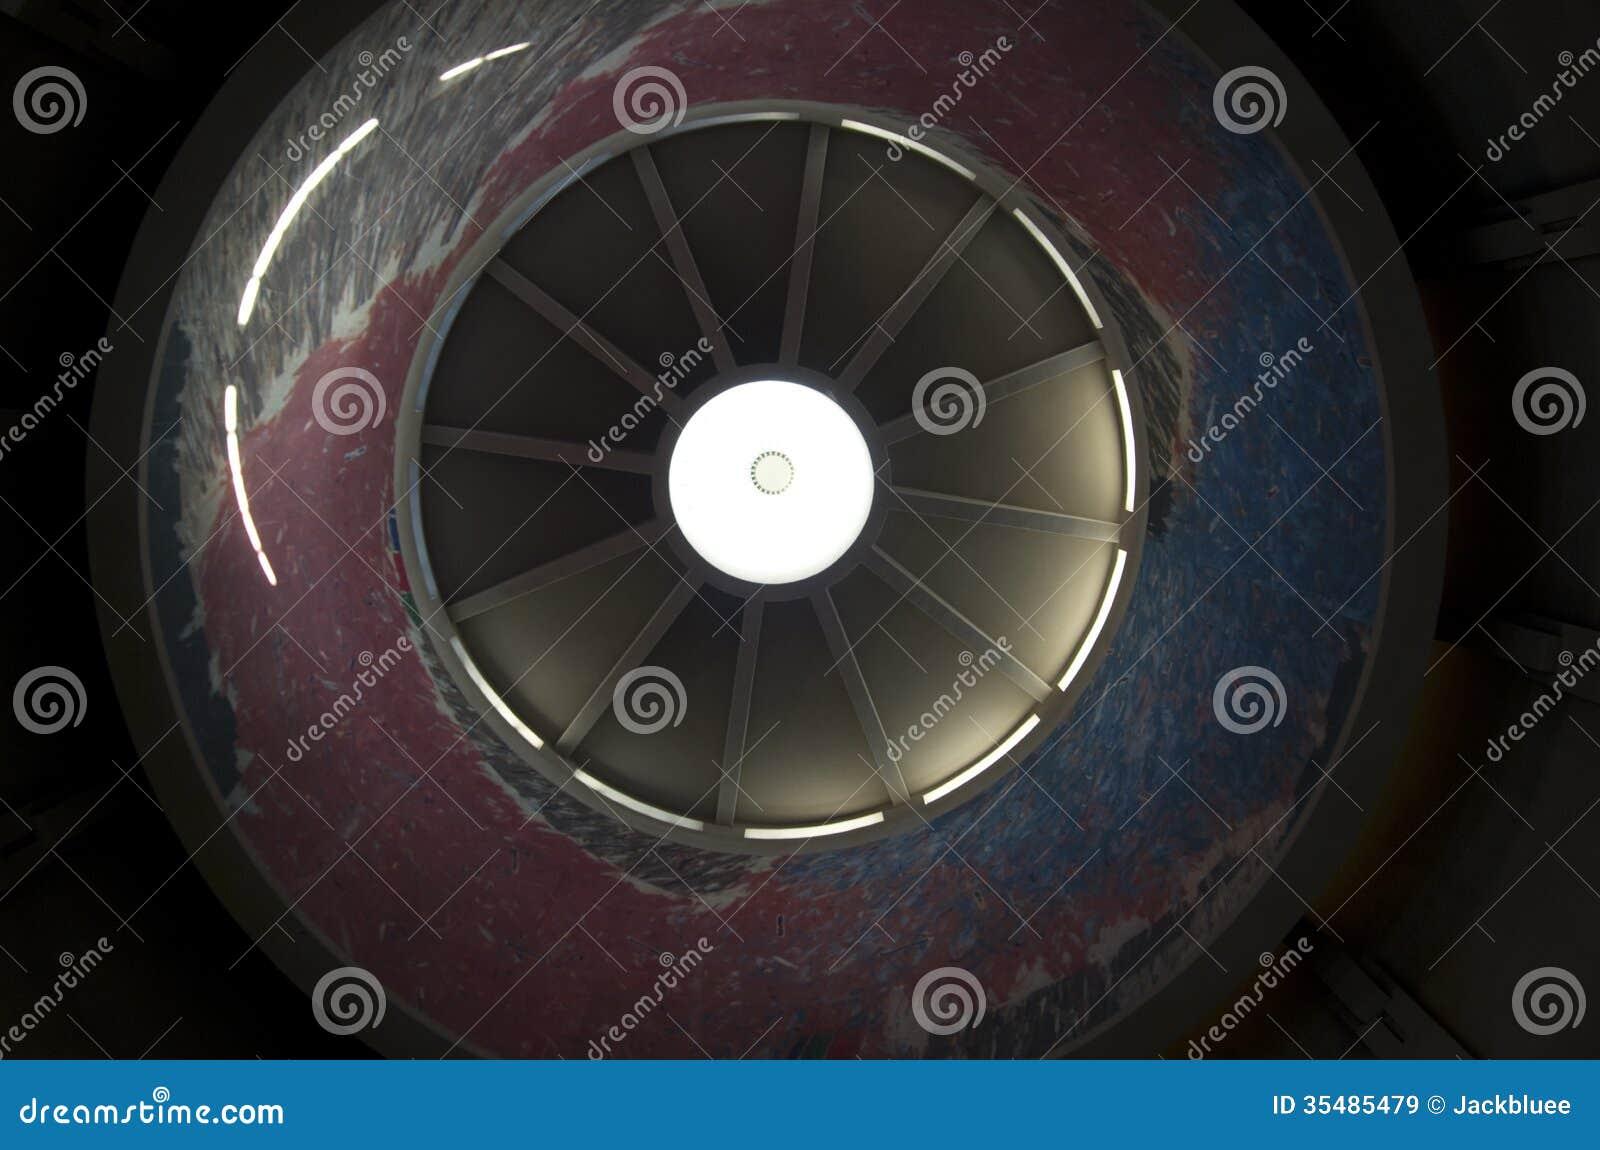 Dome ceiling architectural design